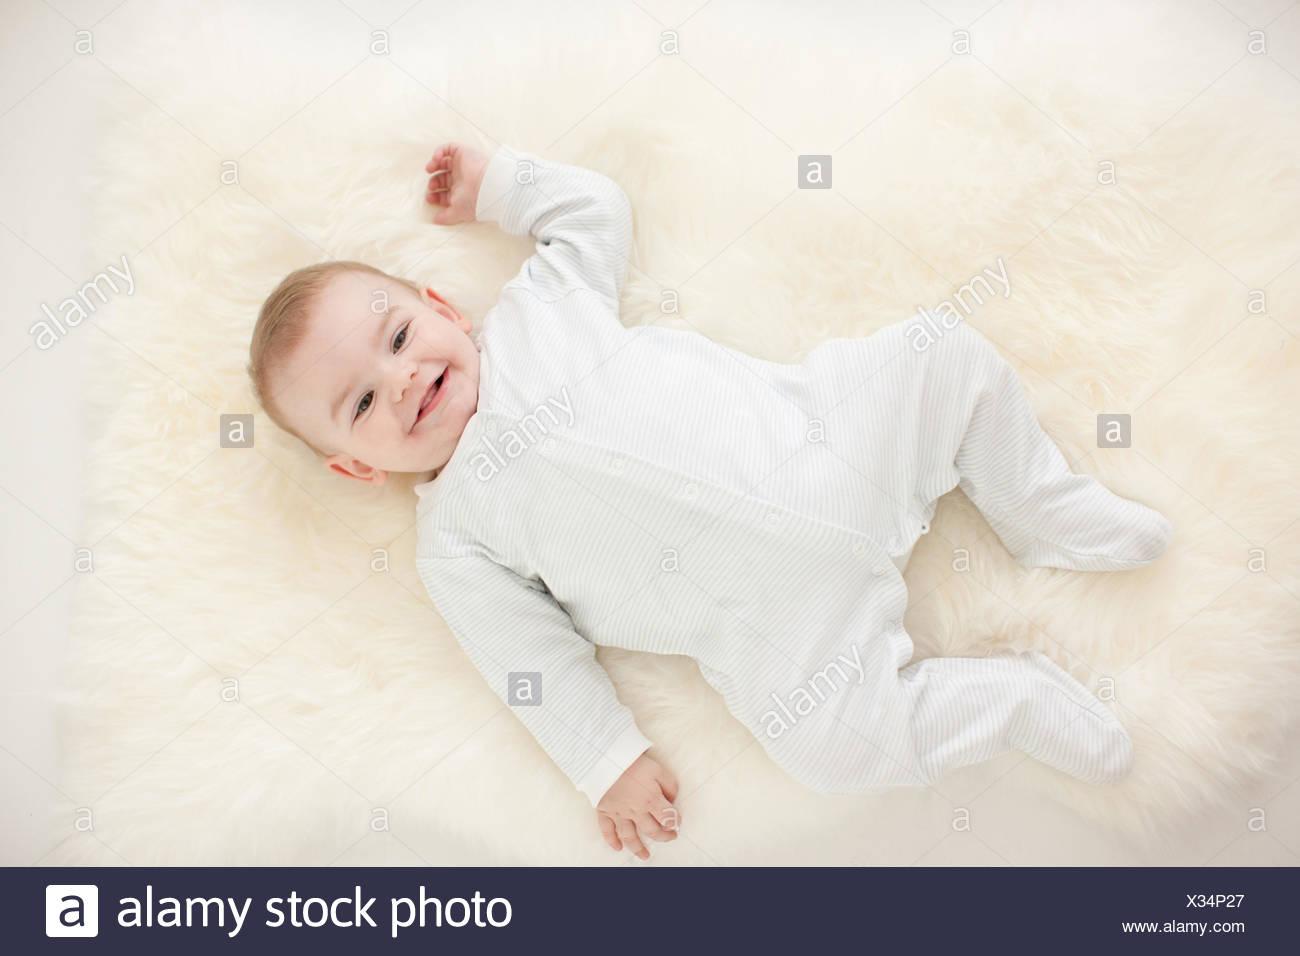 Smiling baby laying on rug - Stock Image